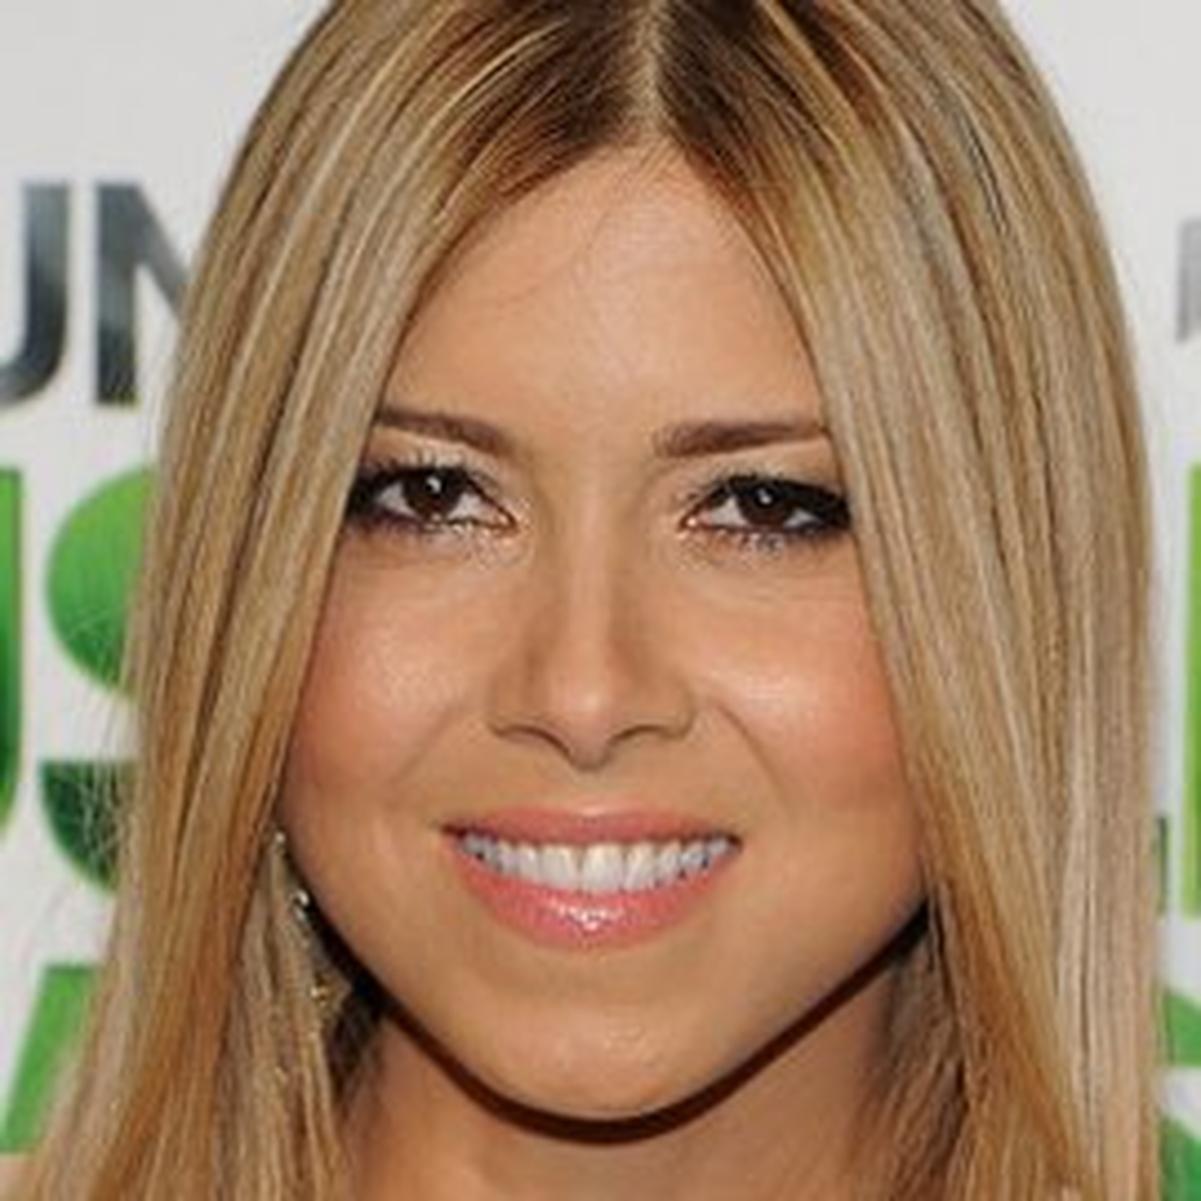 Simone Reyes